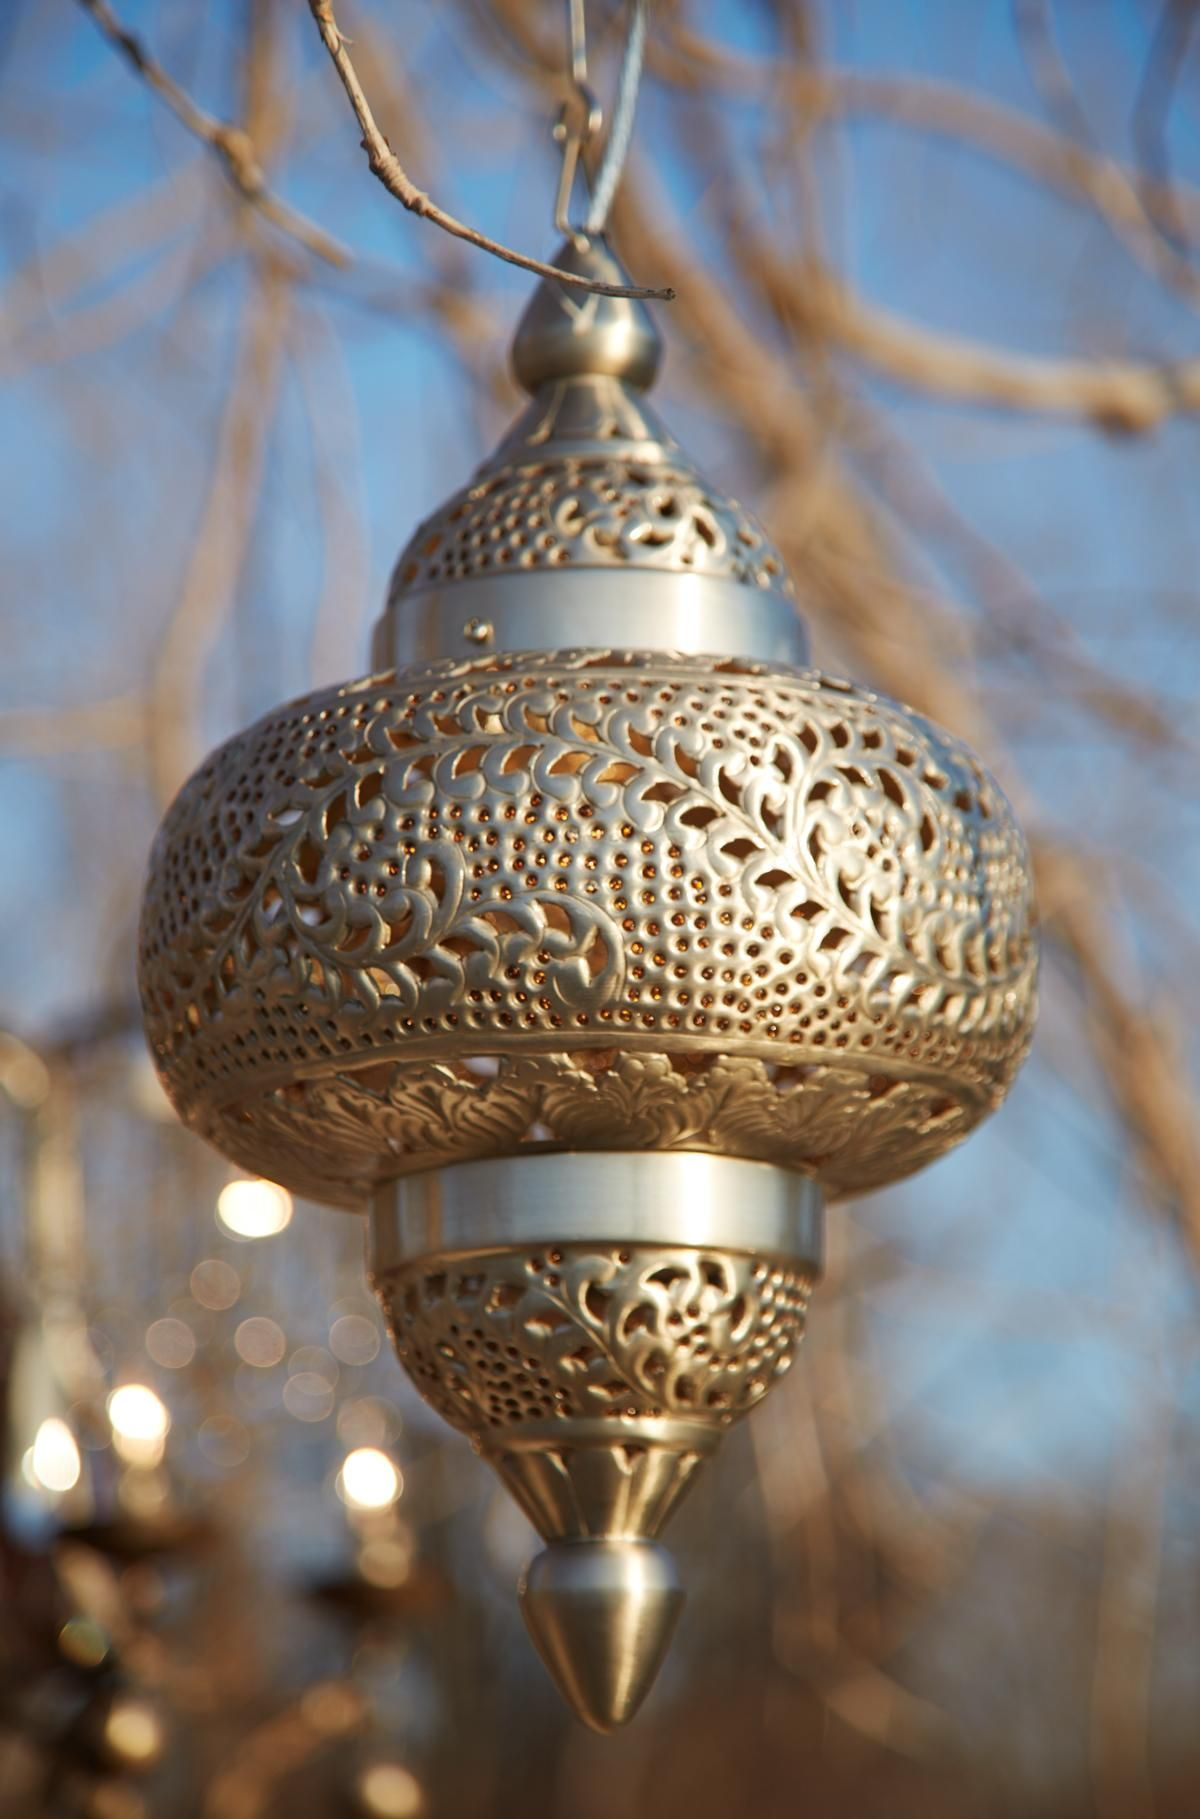 The Taza pendant ing soon to arhaus